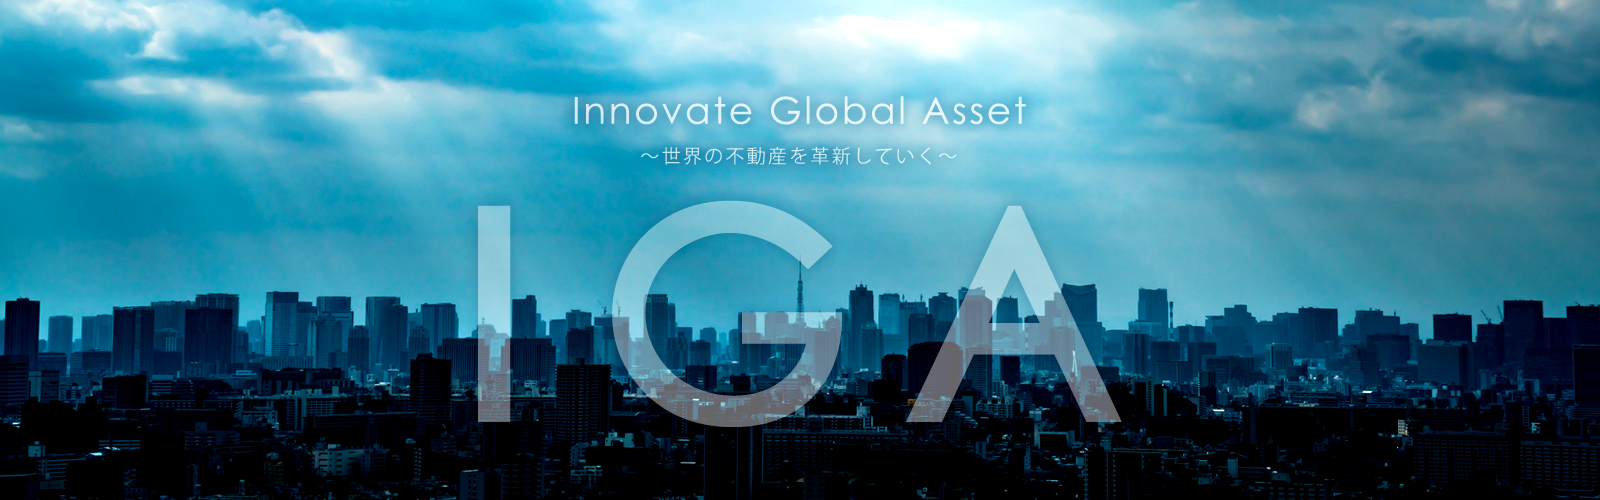 """Innovation Global Asset"""